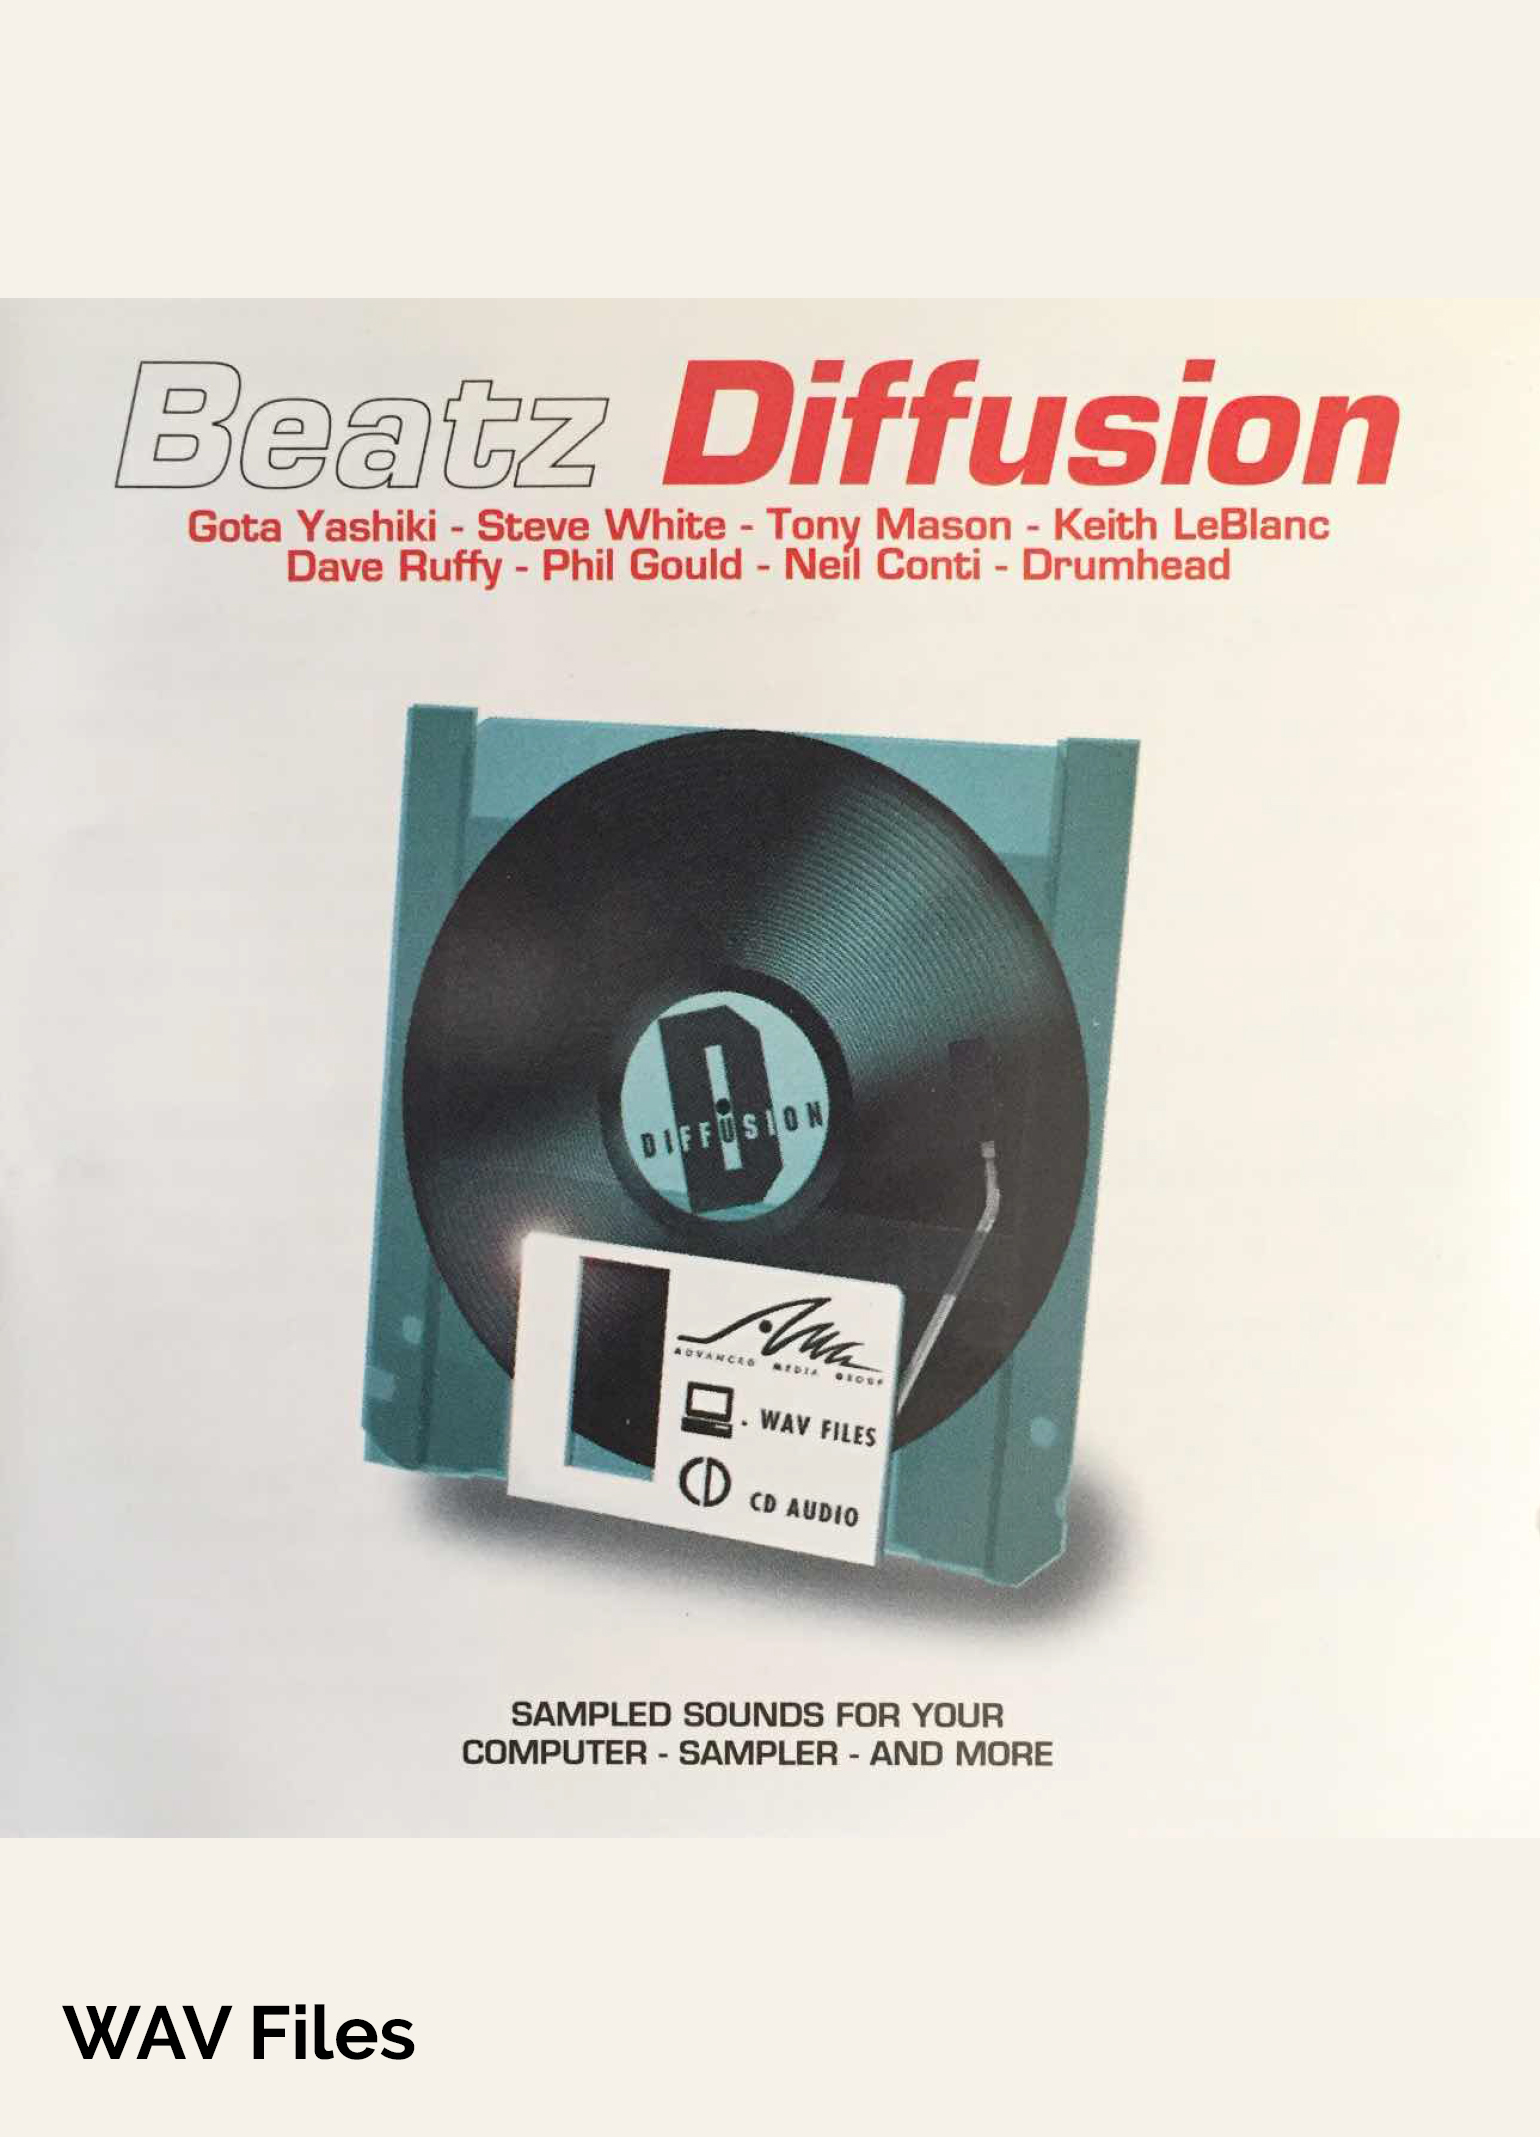 Amg Sample Cd (Beatz Diffusion - Drum Loop Library at Special Low Price - WAV Files)